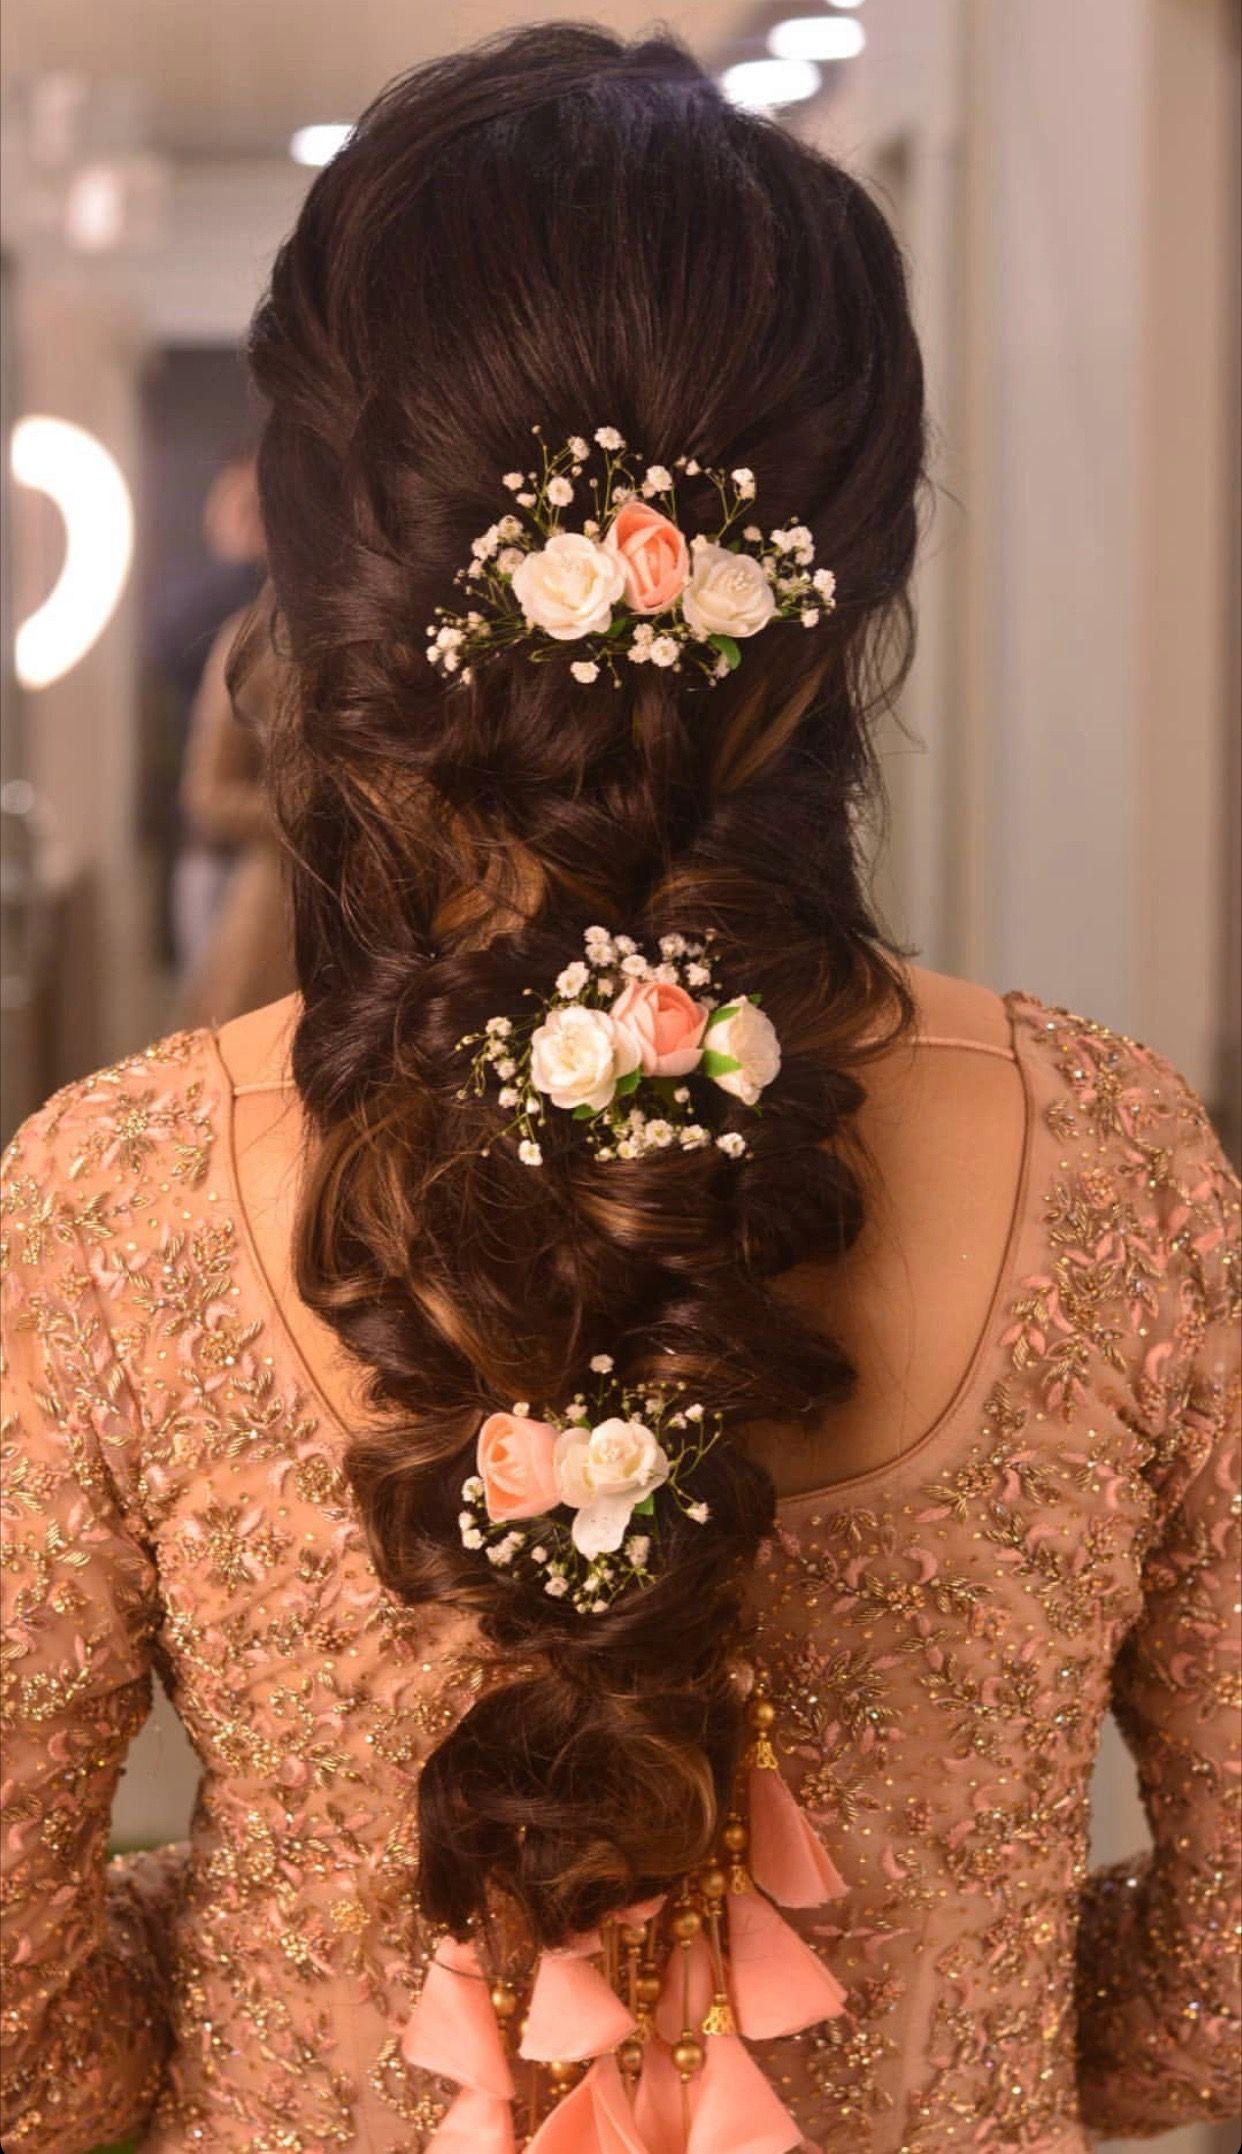 Pinterest Pawank90 Wedding Hairstyles For Long Hair Bridal Hairstyle For Reception Bridal Hair Buns